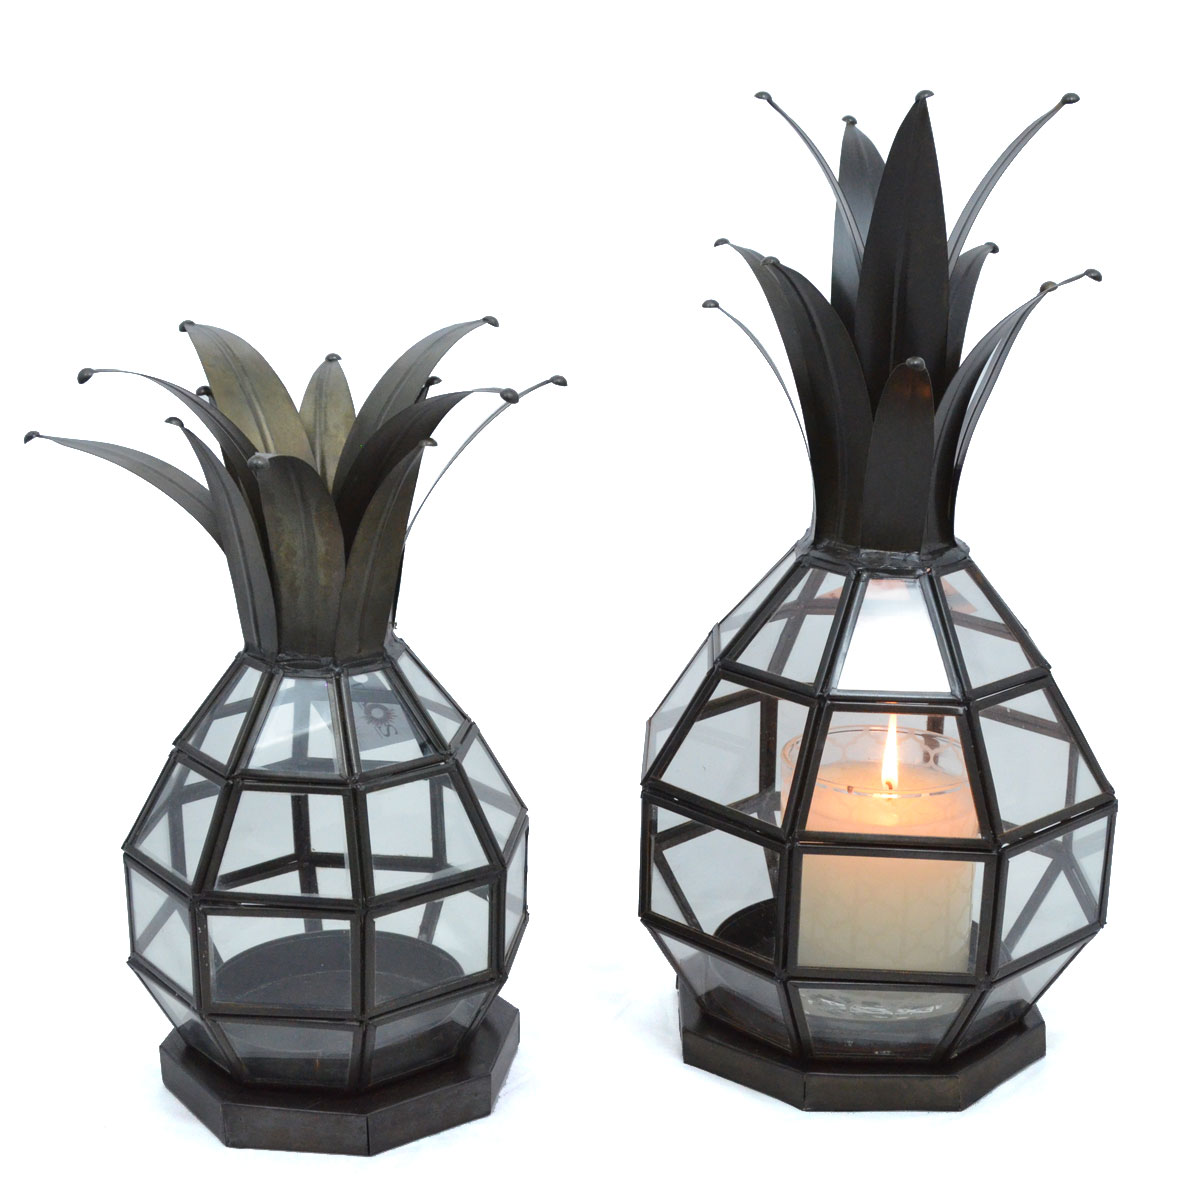 Paulo Cortes Higuera & Family: Small & Large Tin Work Pineapple Shaped Lantern